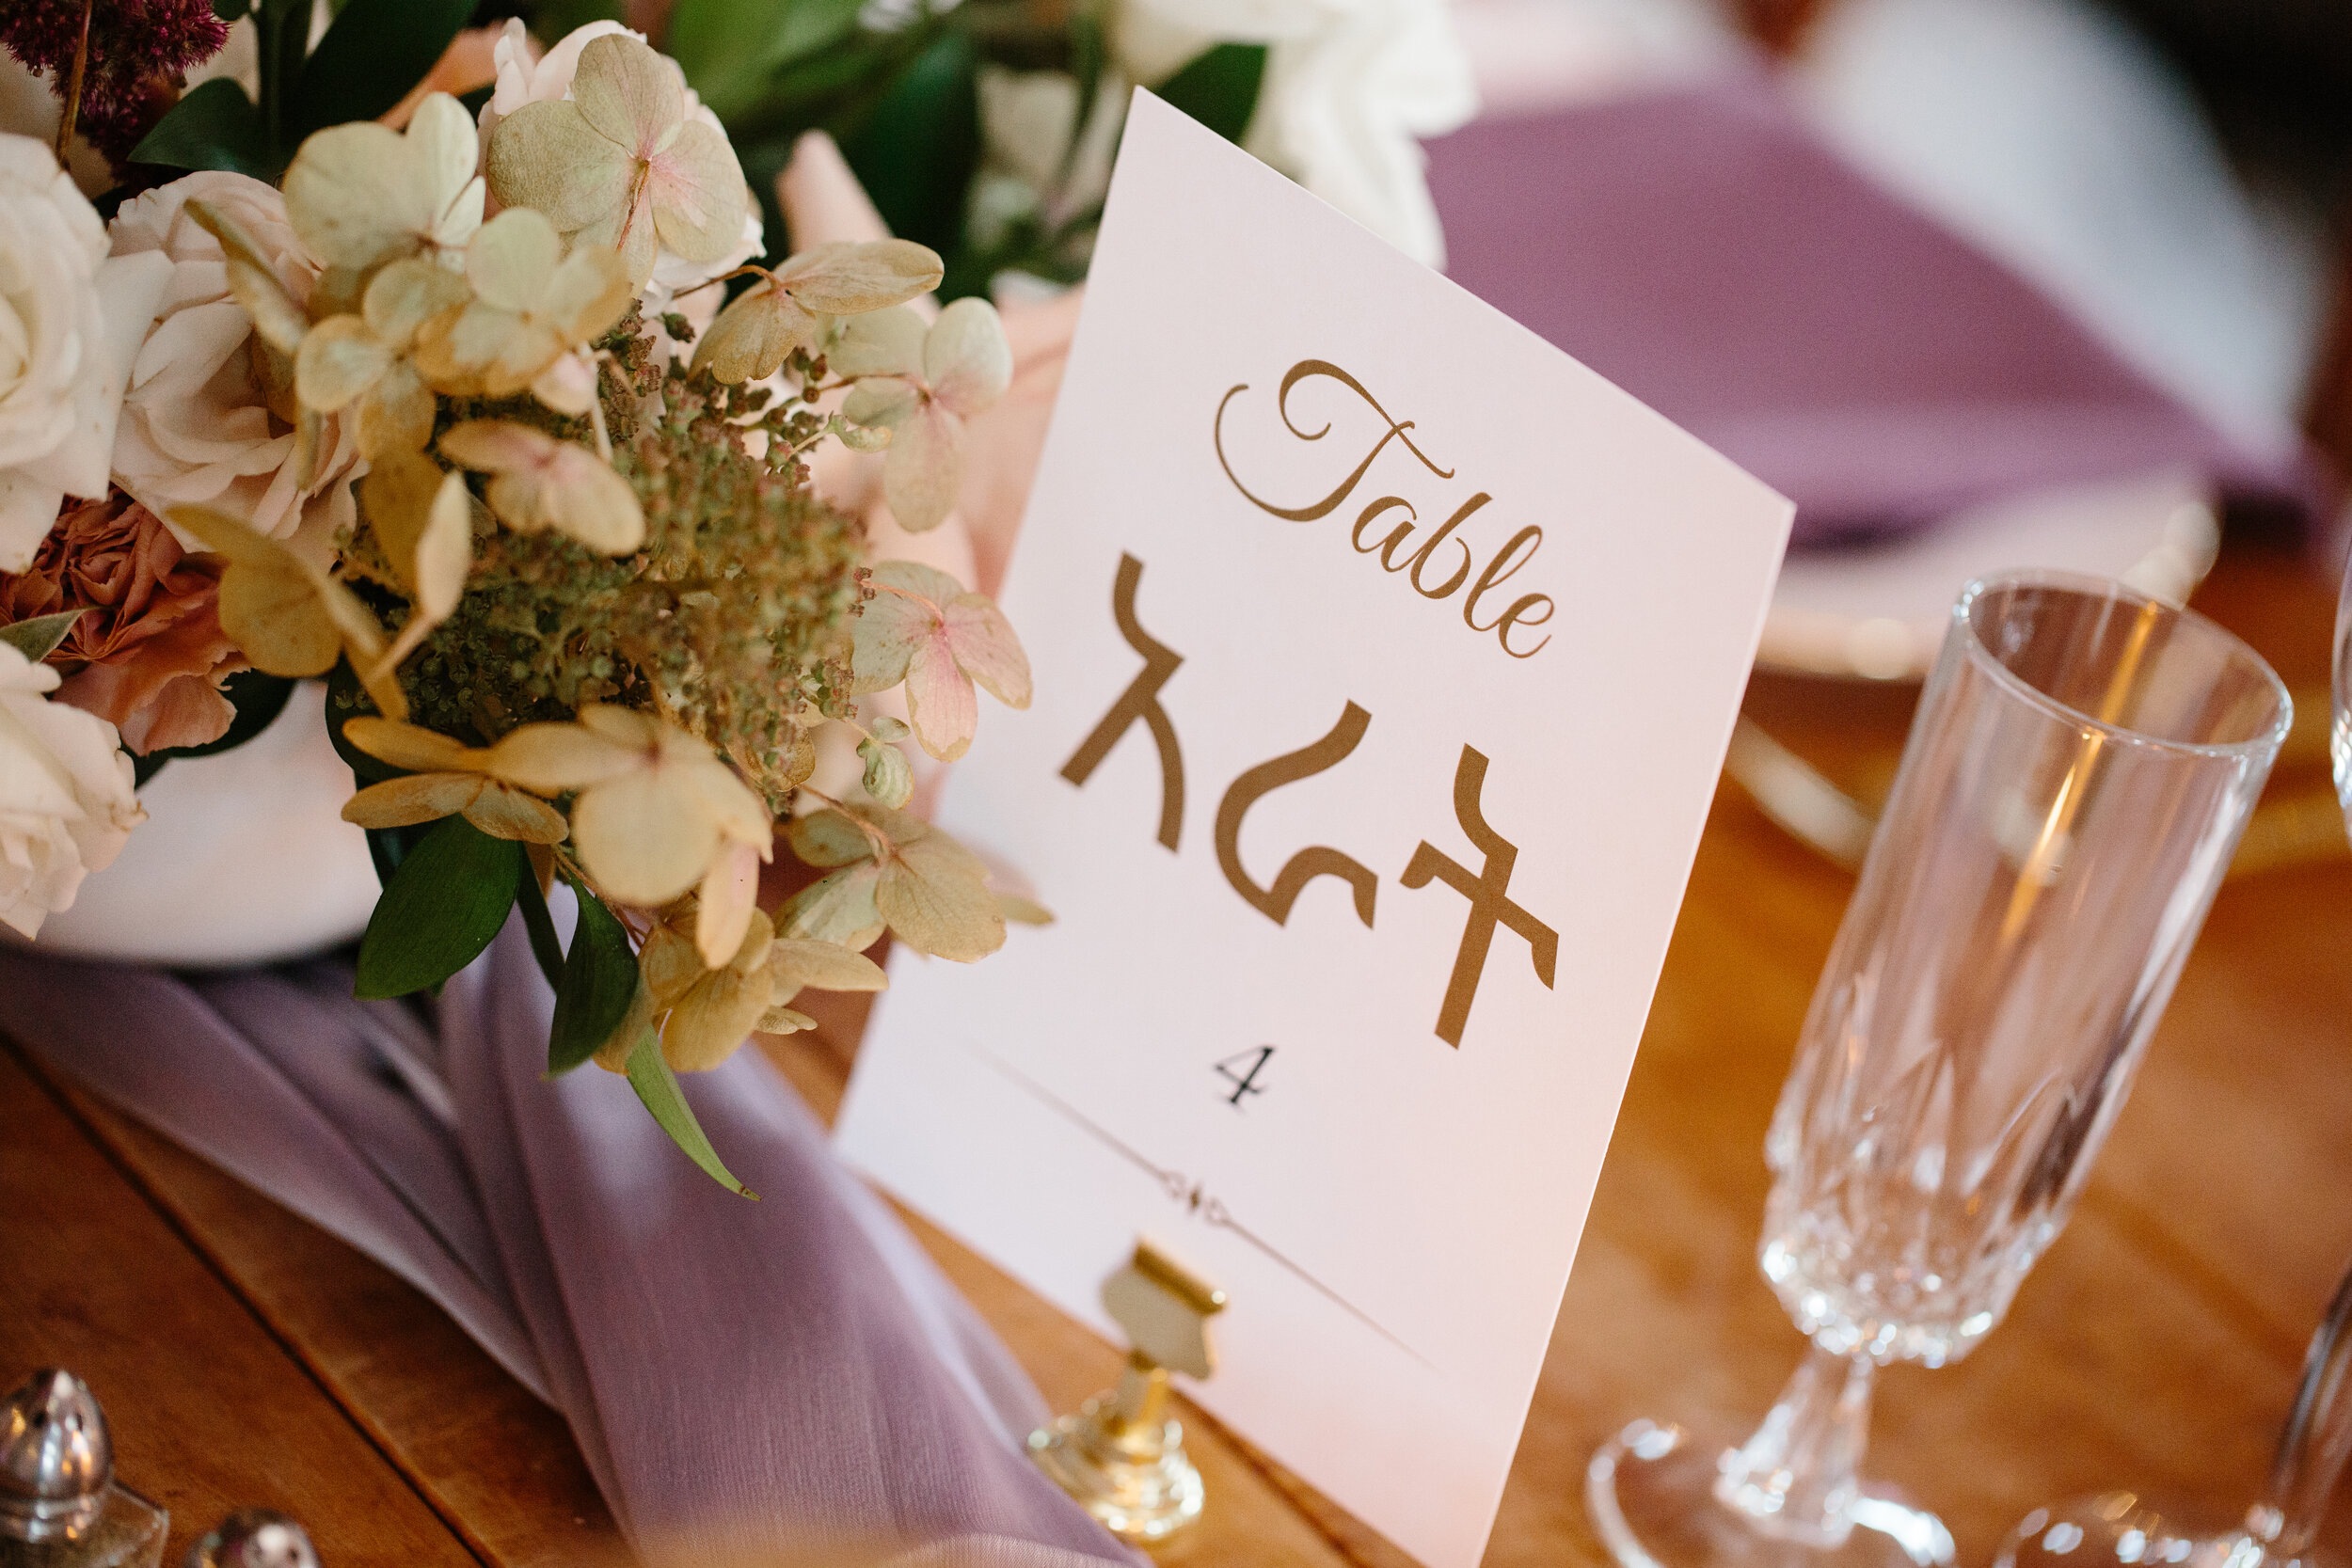 Shante-Asteway-Wedding-Andrew-Roby-Events-7.jpg